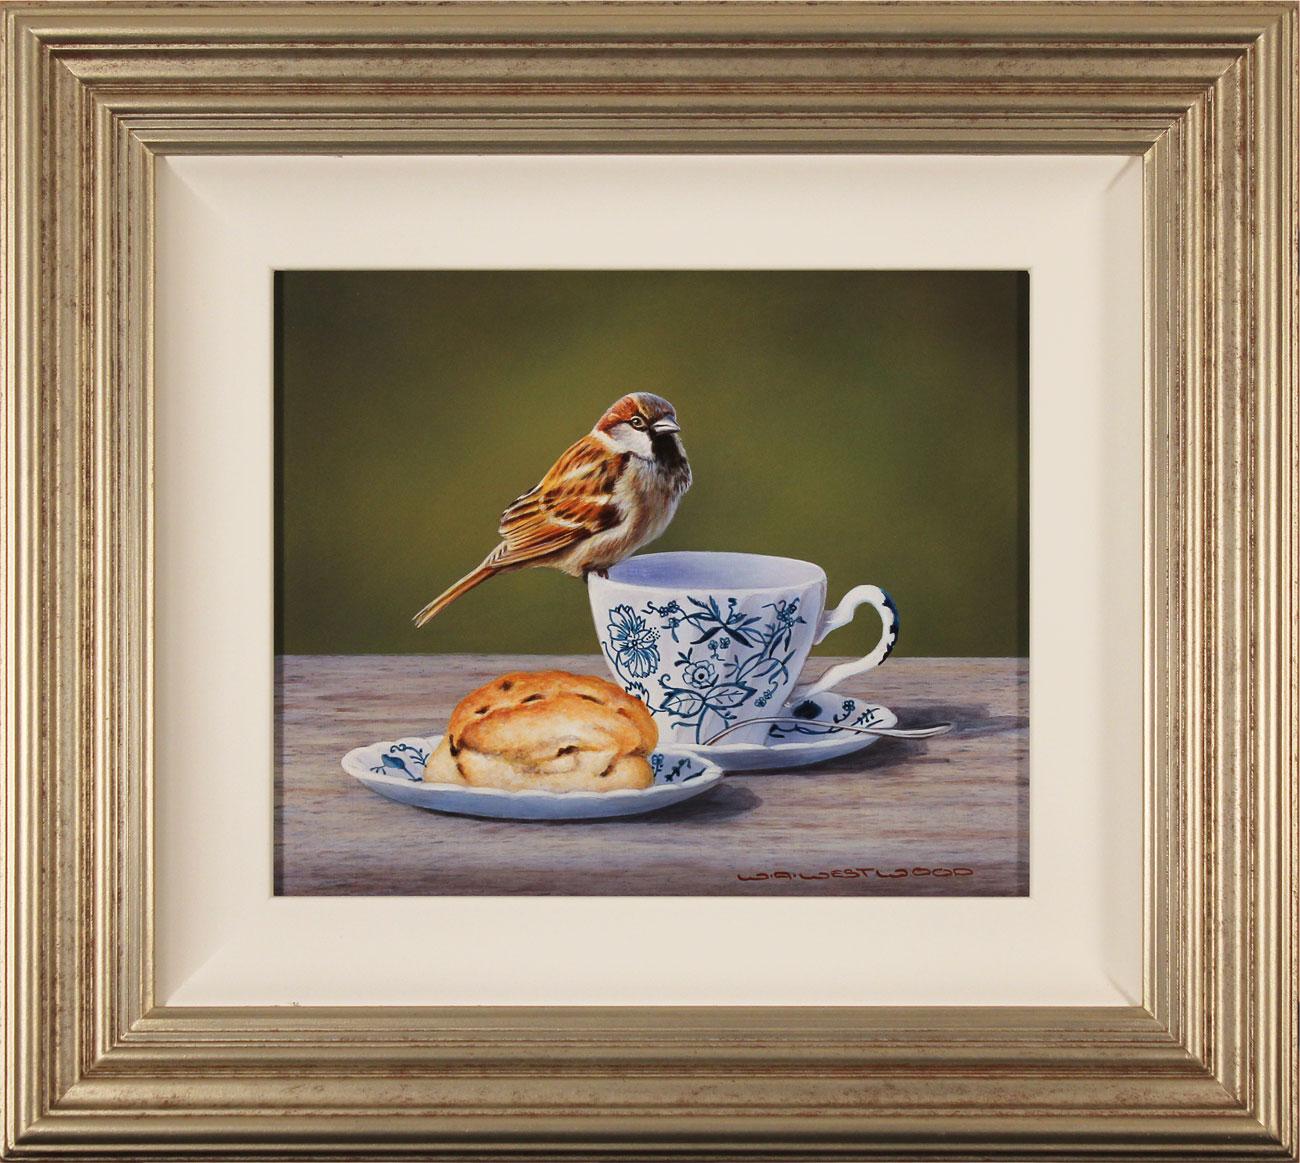 Wayne Westwood, Original oil painting on panel, Afternoon Tea Click to enlarge